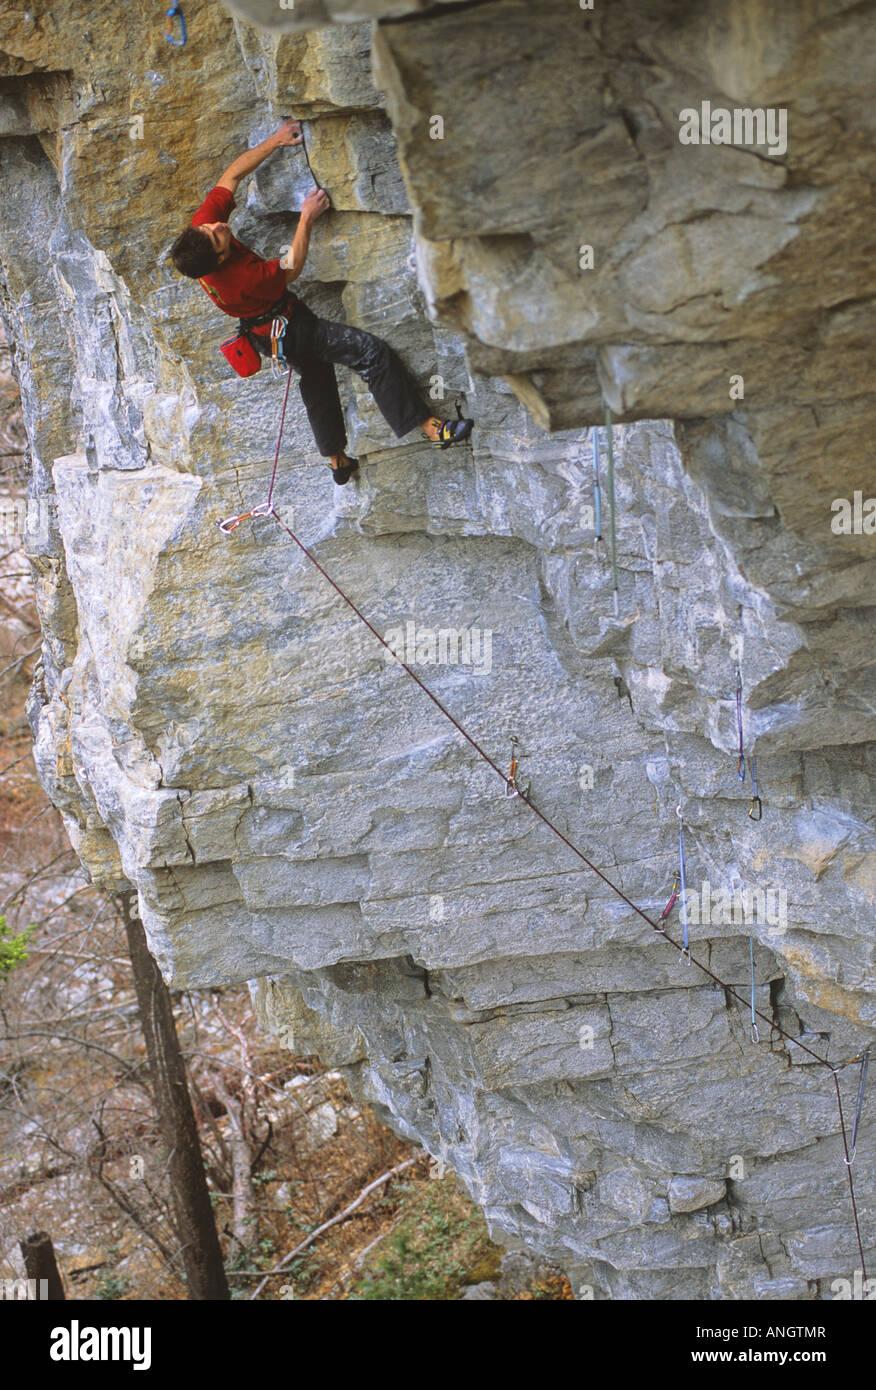 Man climbing Blade Runner, The Belfry Skaha Bluffs, Penticton, British Columbia, Canada. - Stock Image